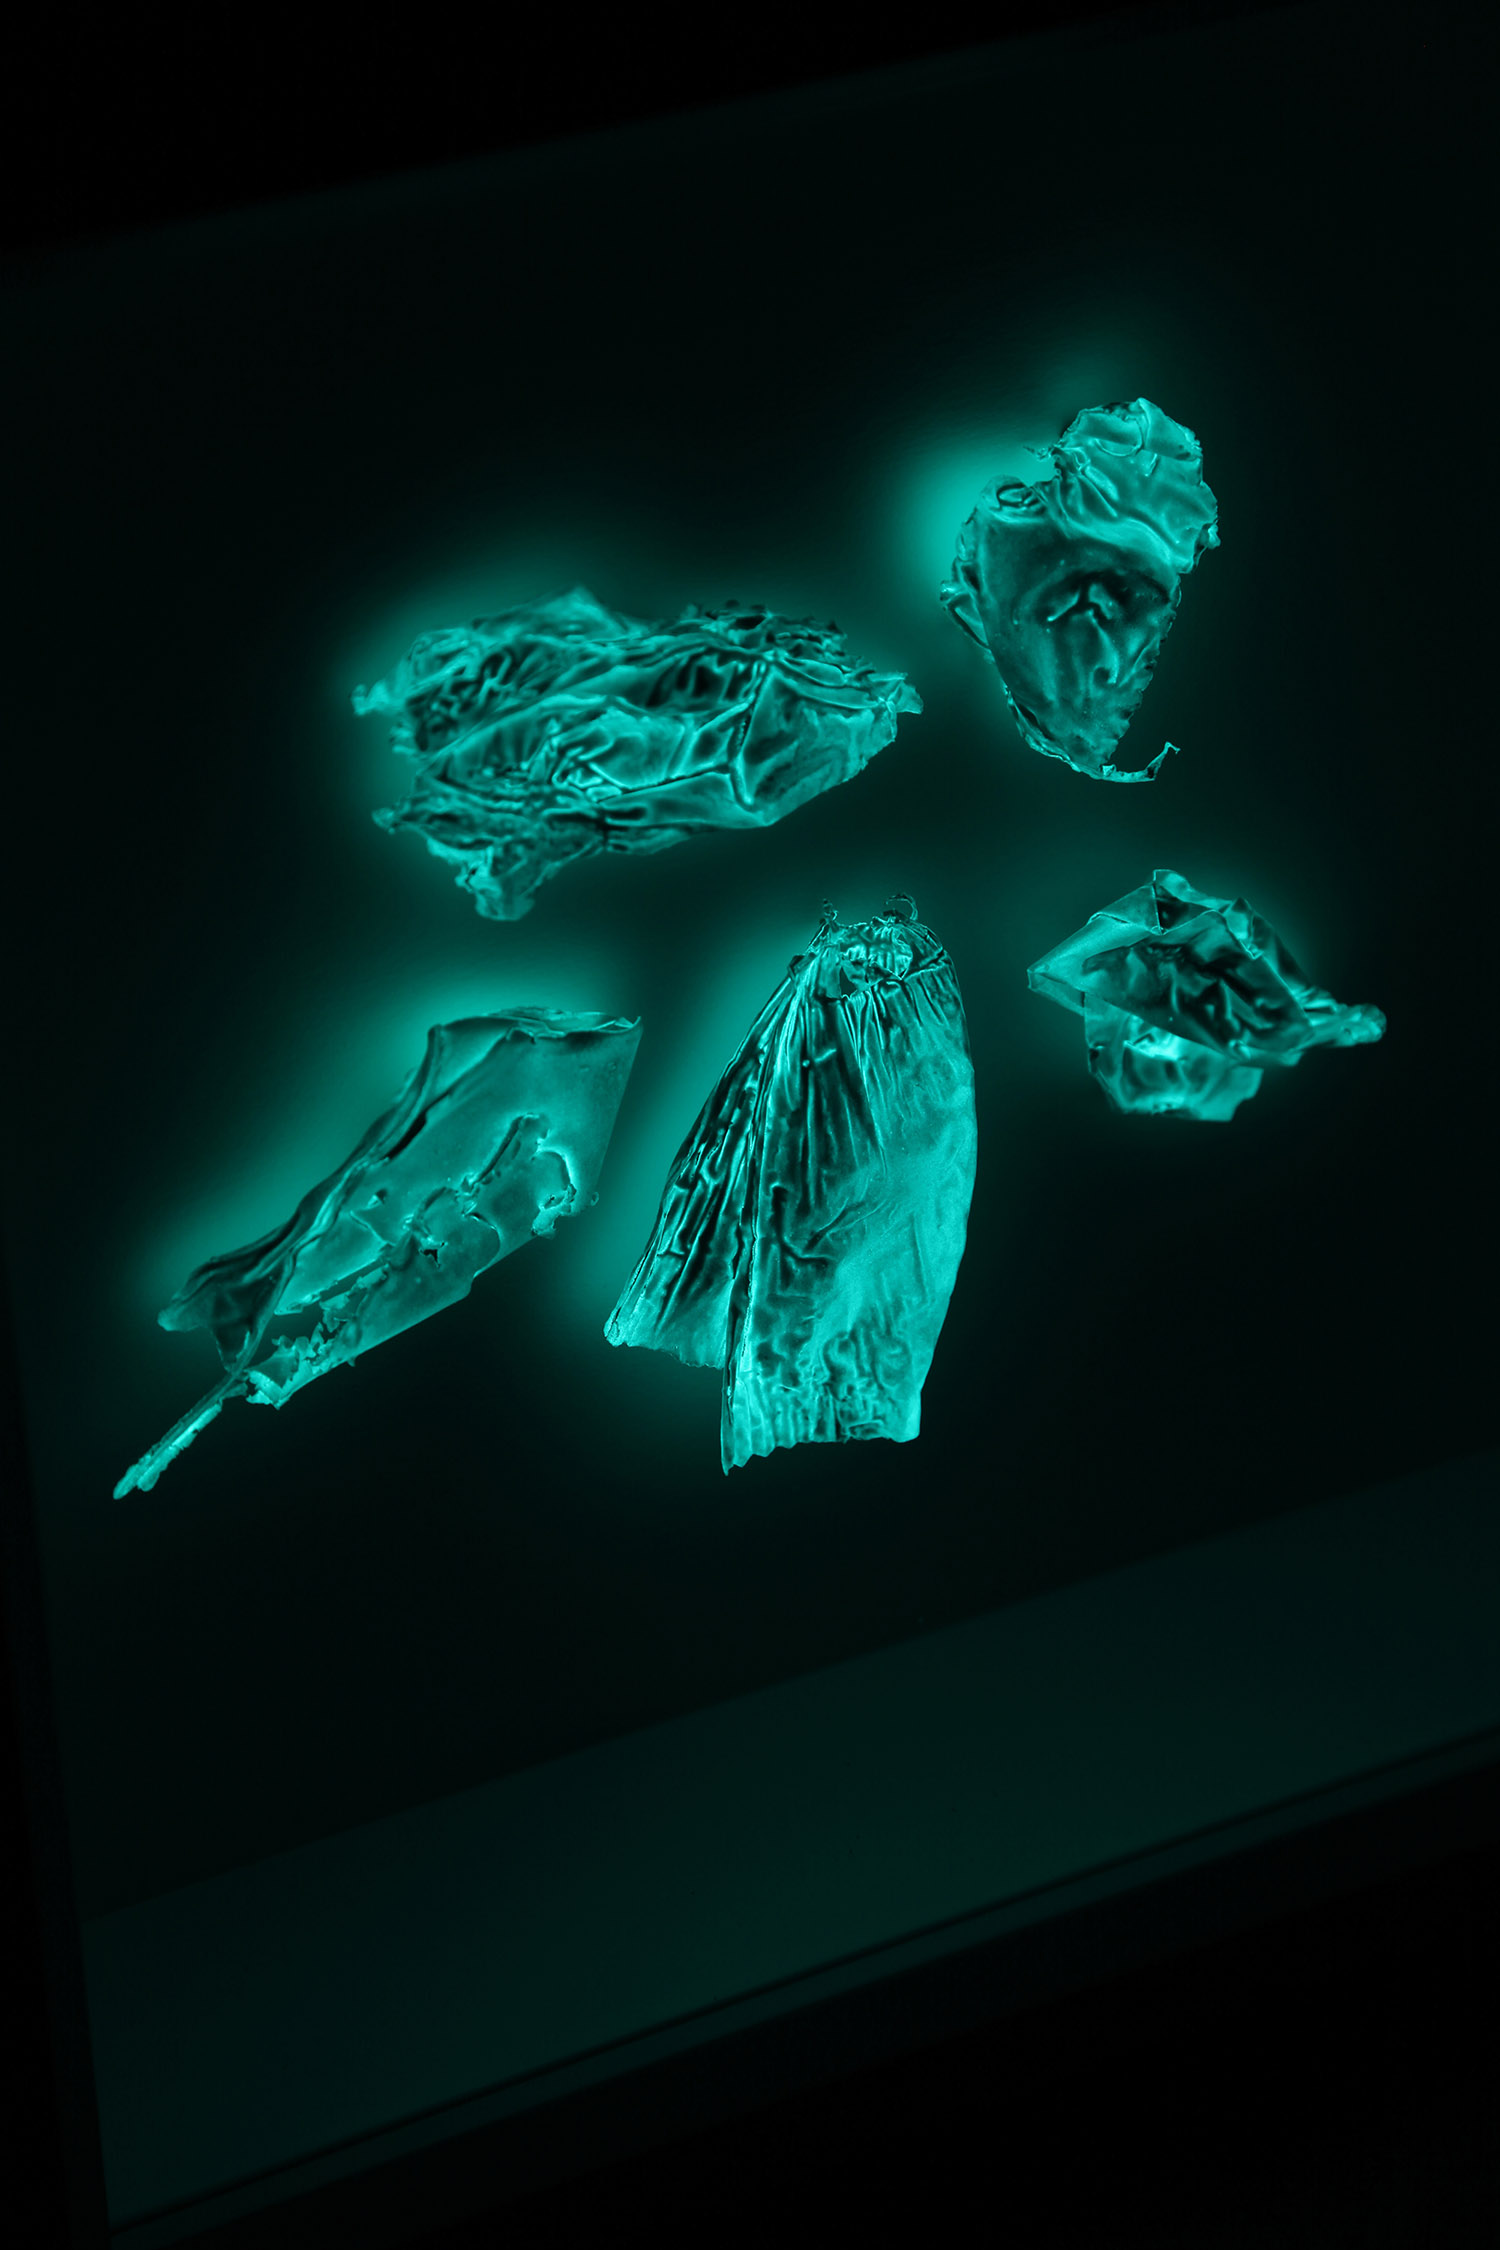 Tüten Konvolut – v01  5 Plastiktütenfragmente ( Weiß / Grün* ) im Objektrahmen – ca. 30 x 30 x 12 cm, Unikat, 2018, Detail